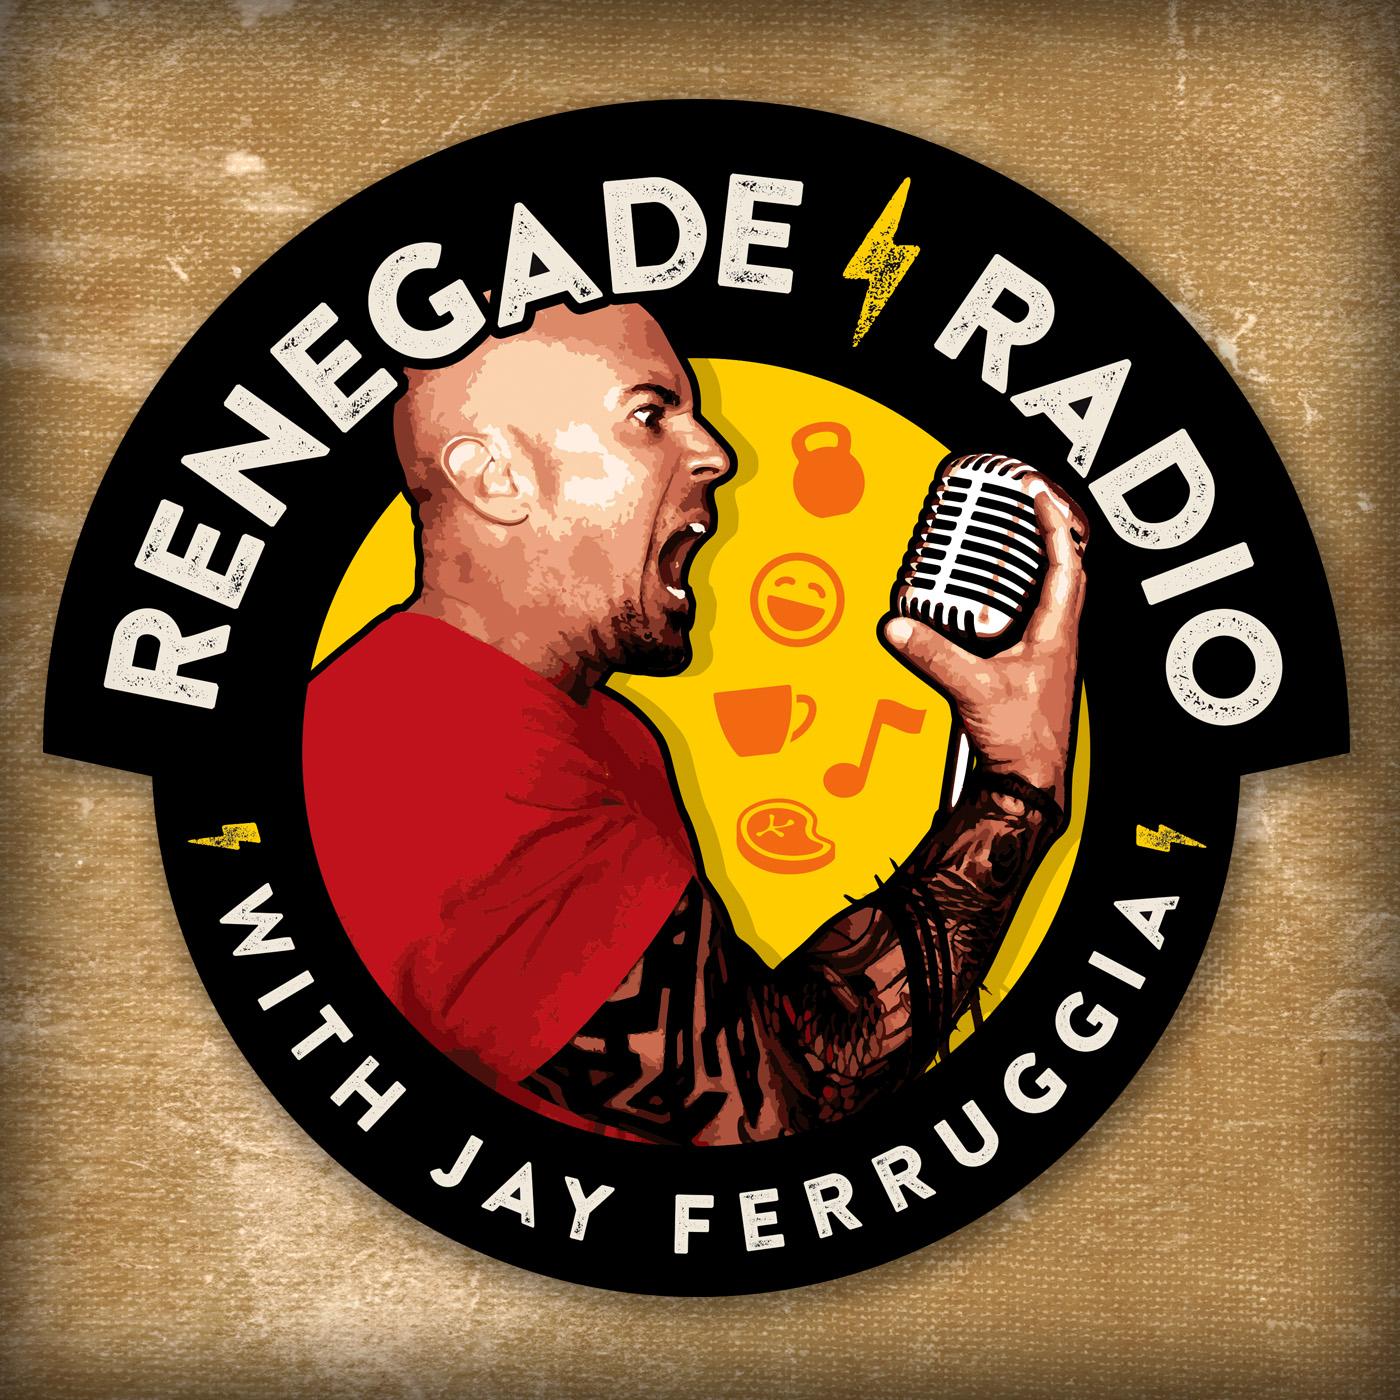 RenRadioPromoBadge.jpeg